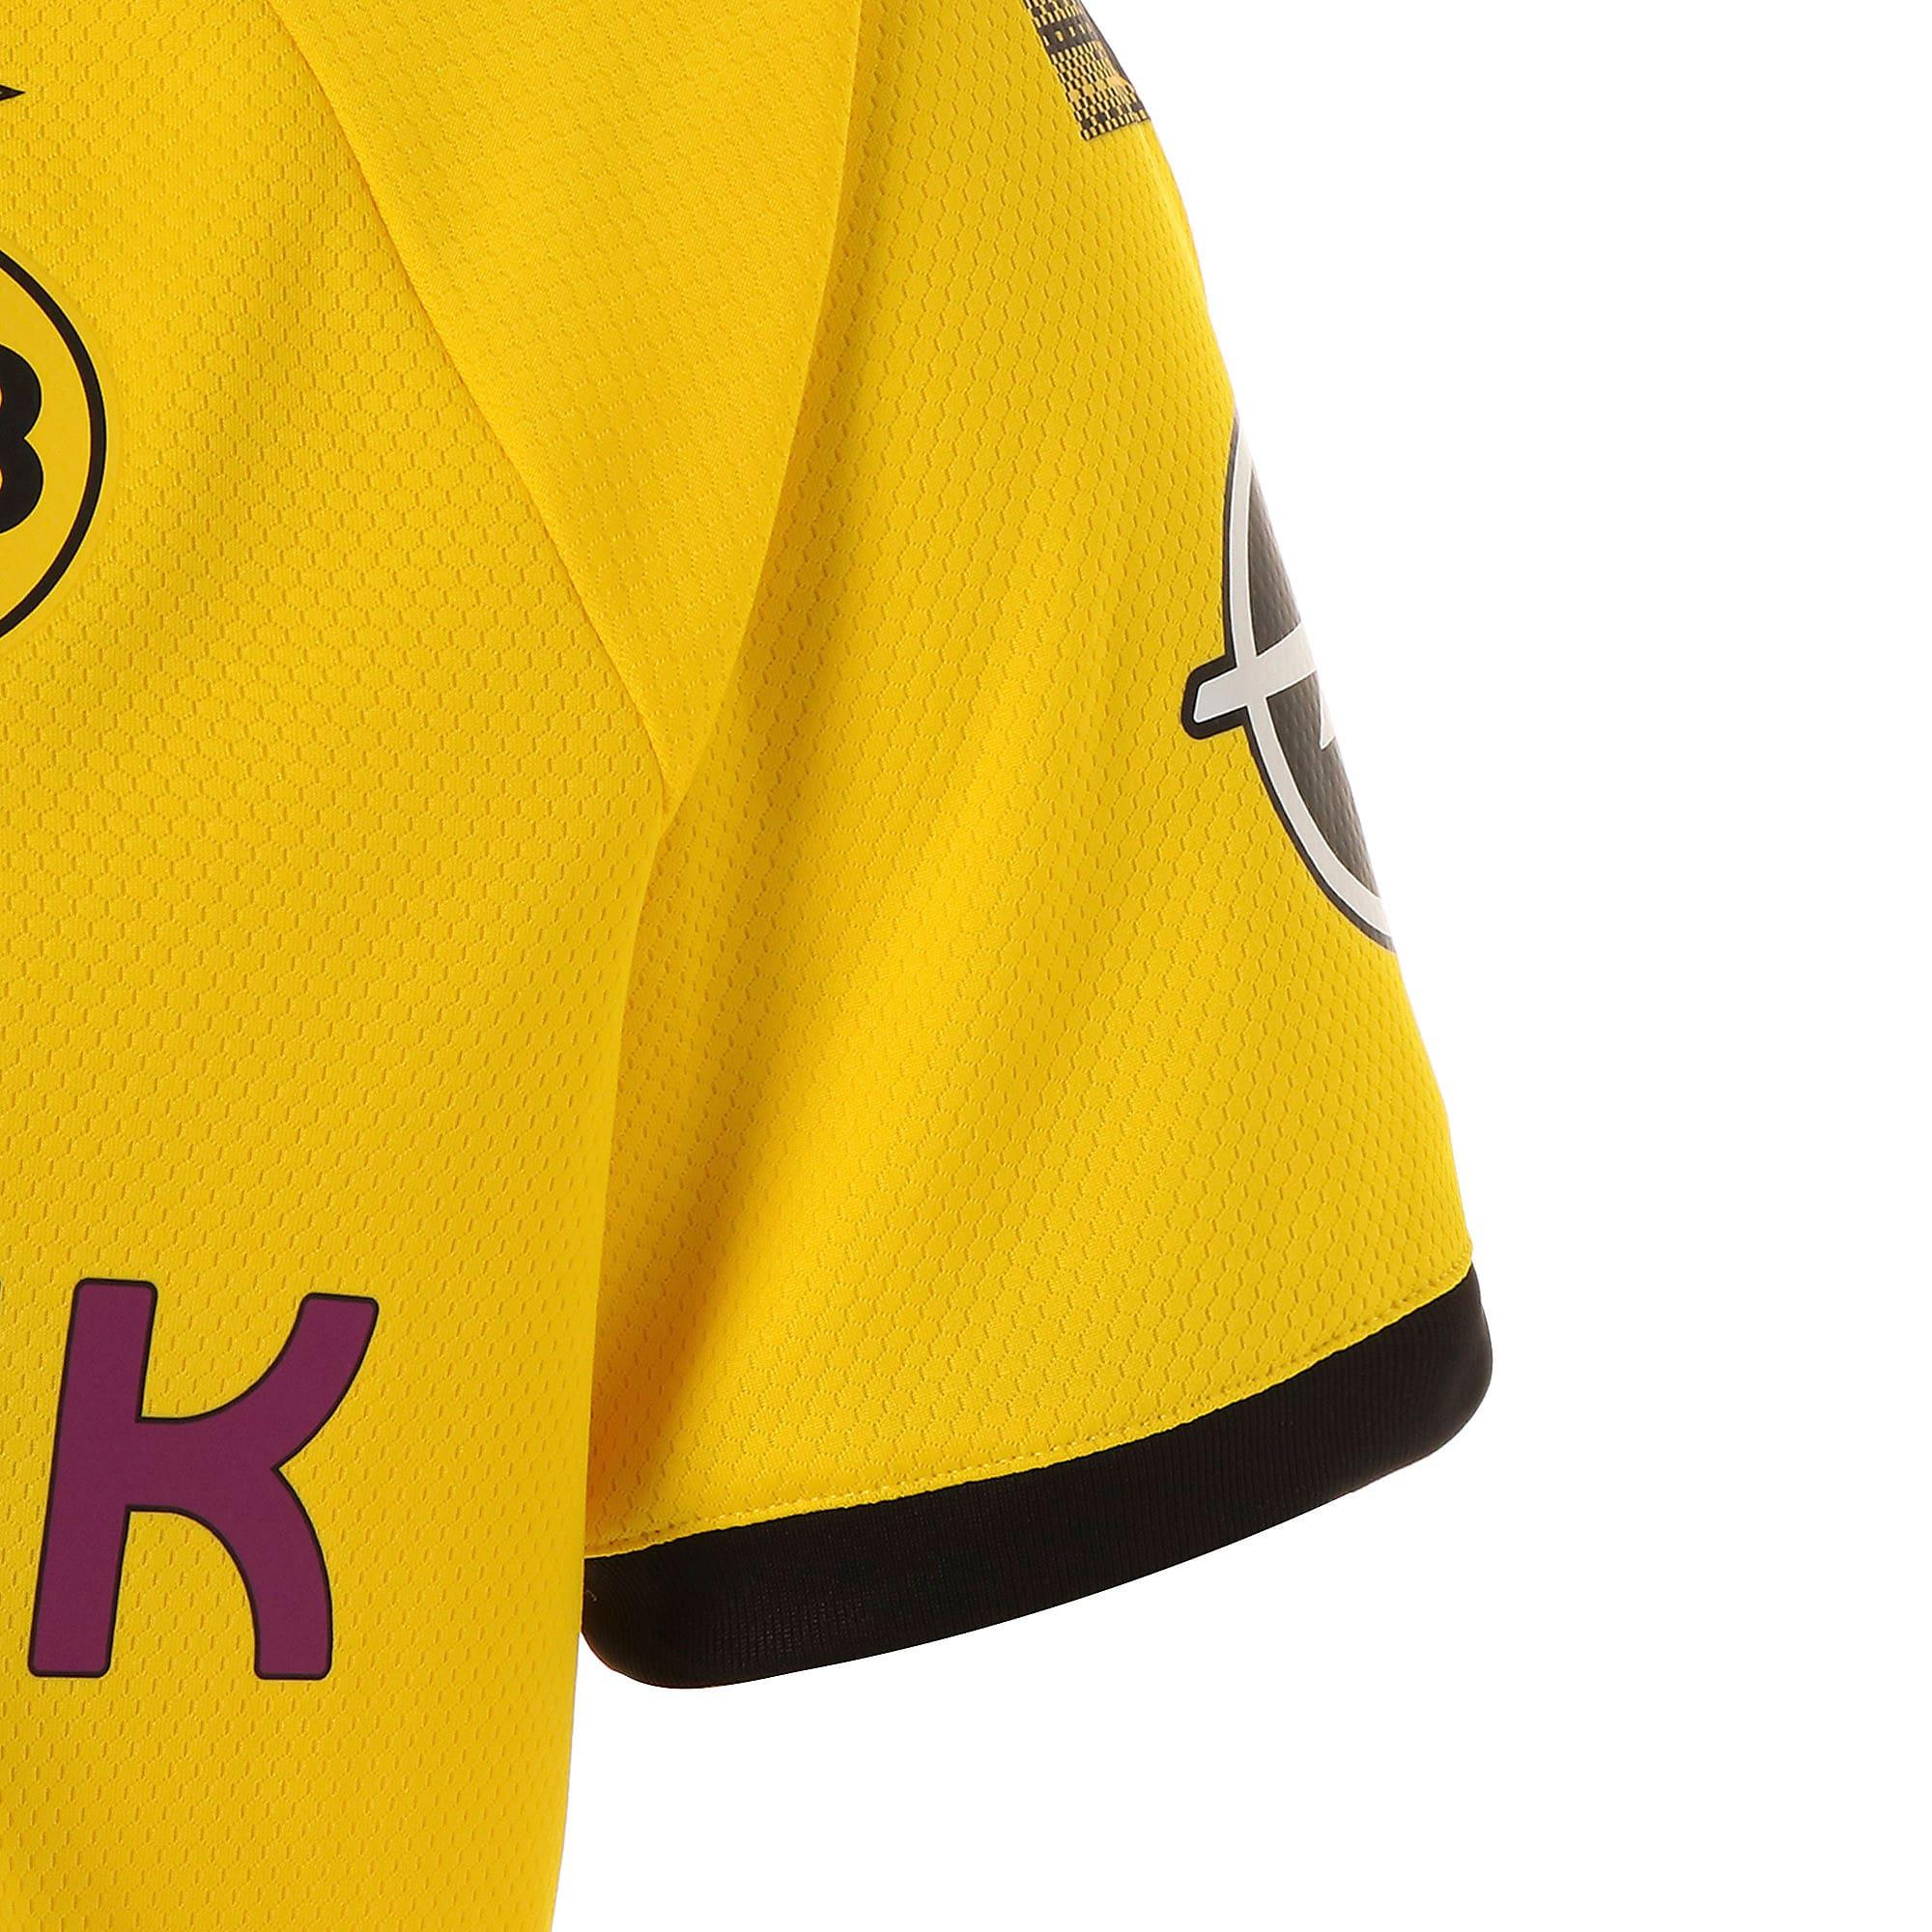 Thumbnail 5 of ドルトムント BVB SS ホーム オーセンティック シャツ 半袖, Cyber Yellow-Puma Black, medium-JPN